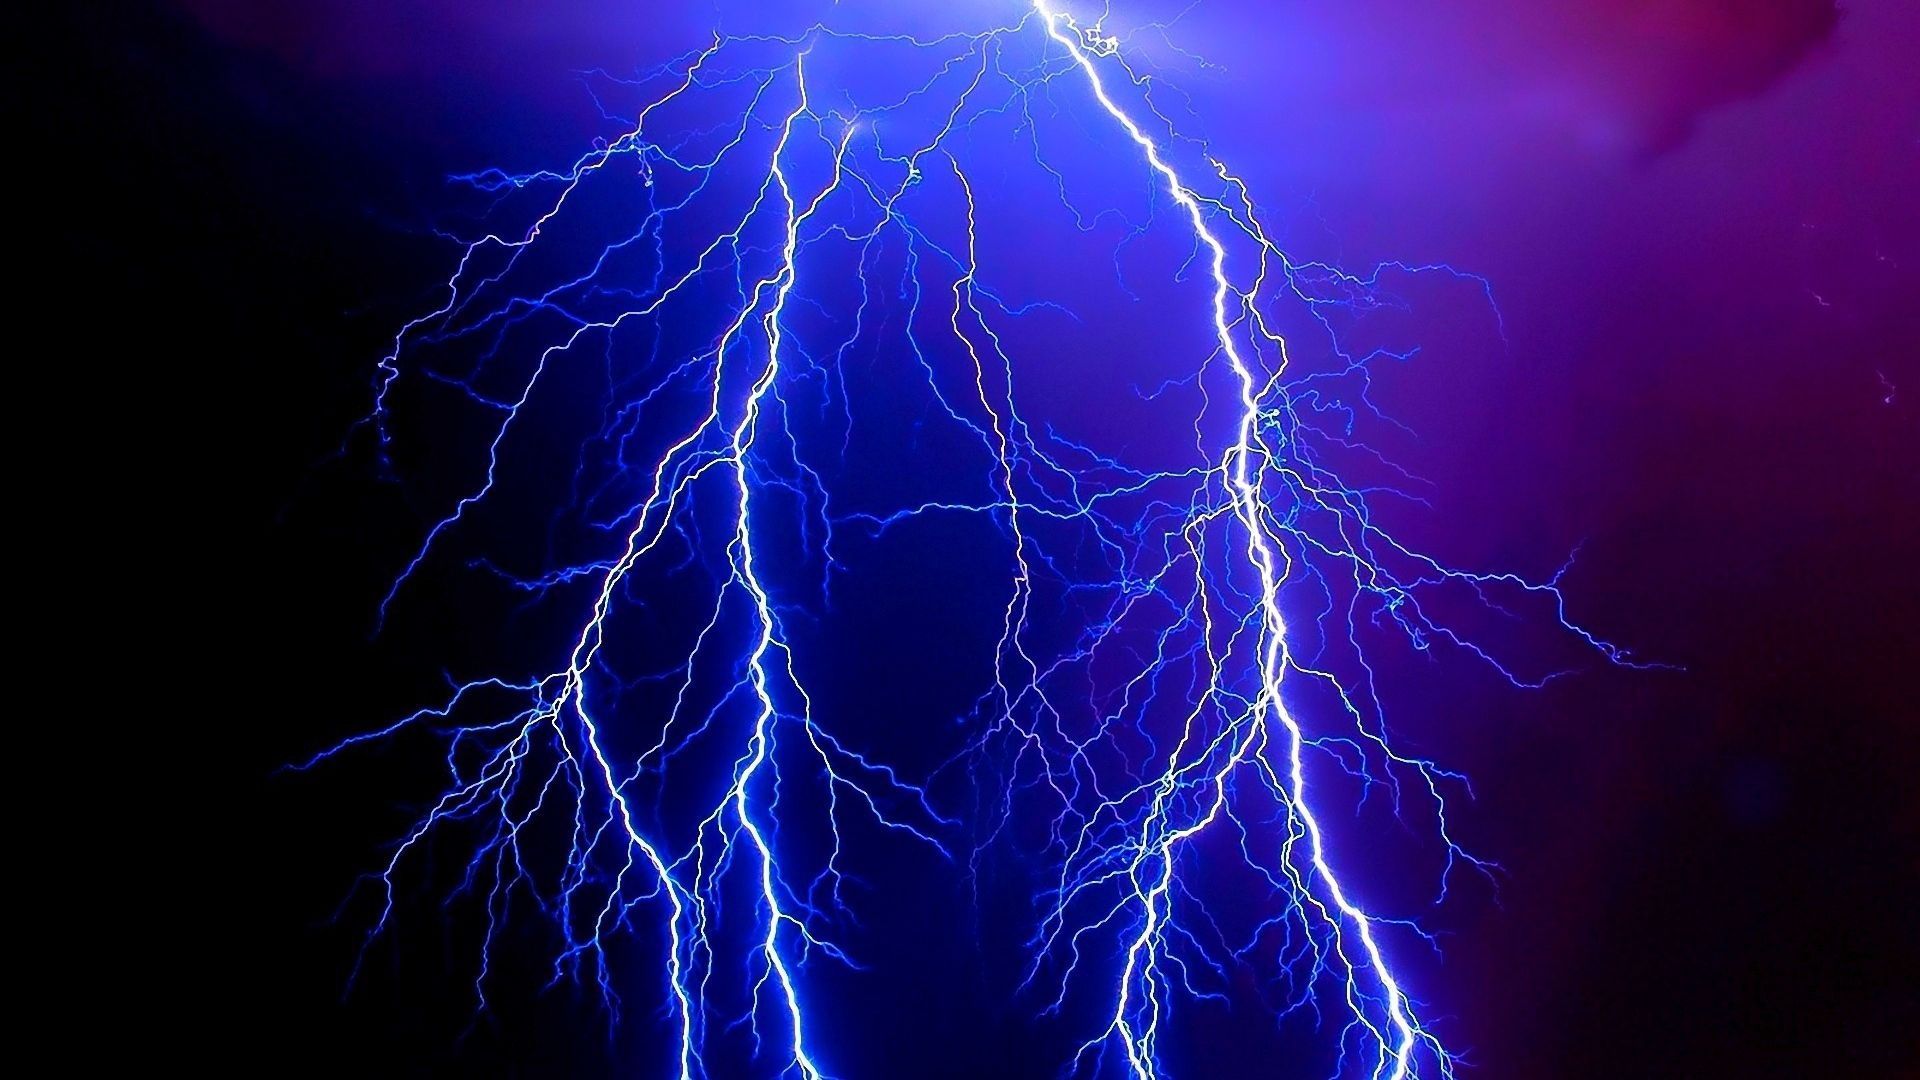 Pin On Rain And Lightning